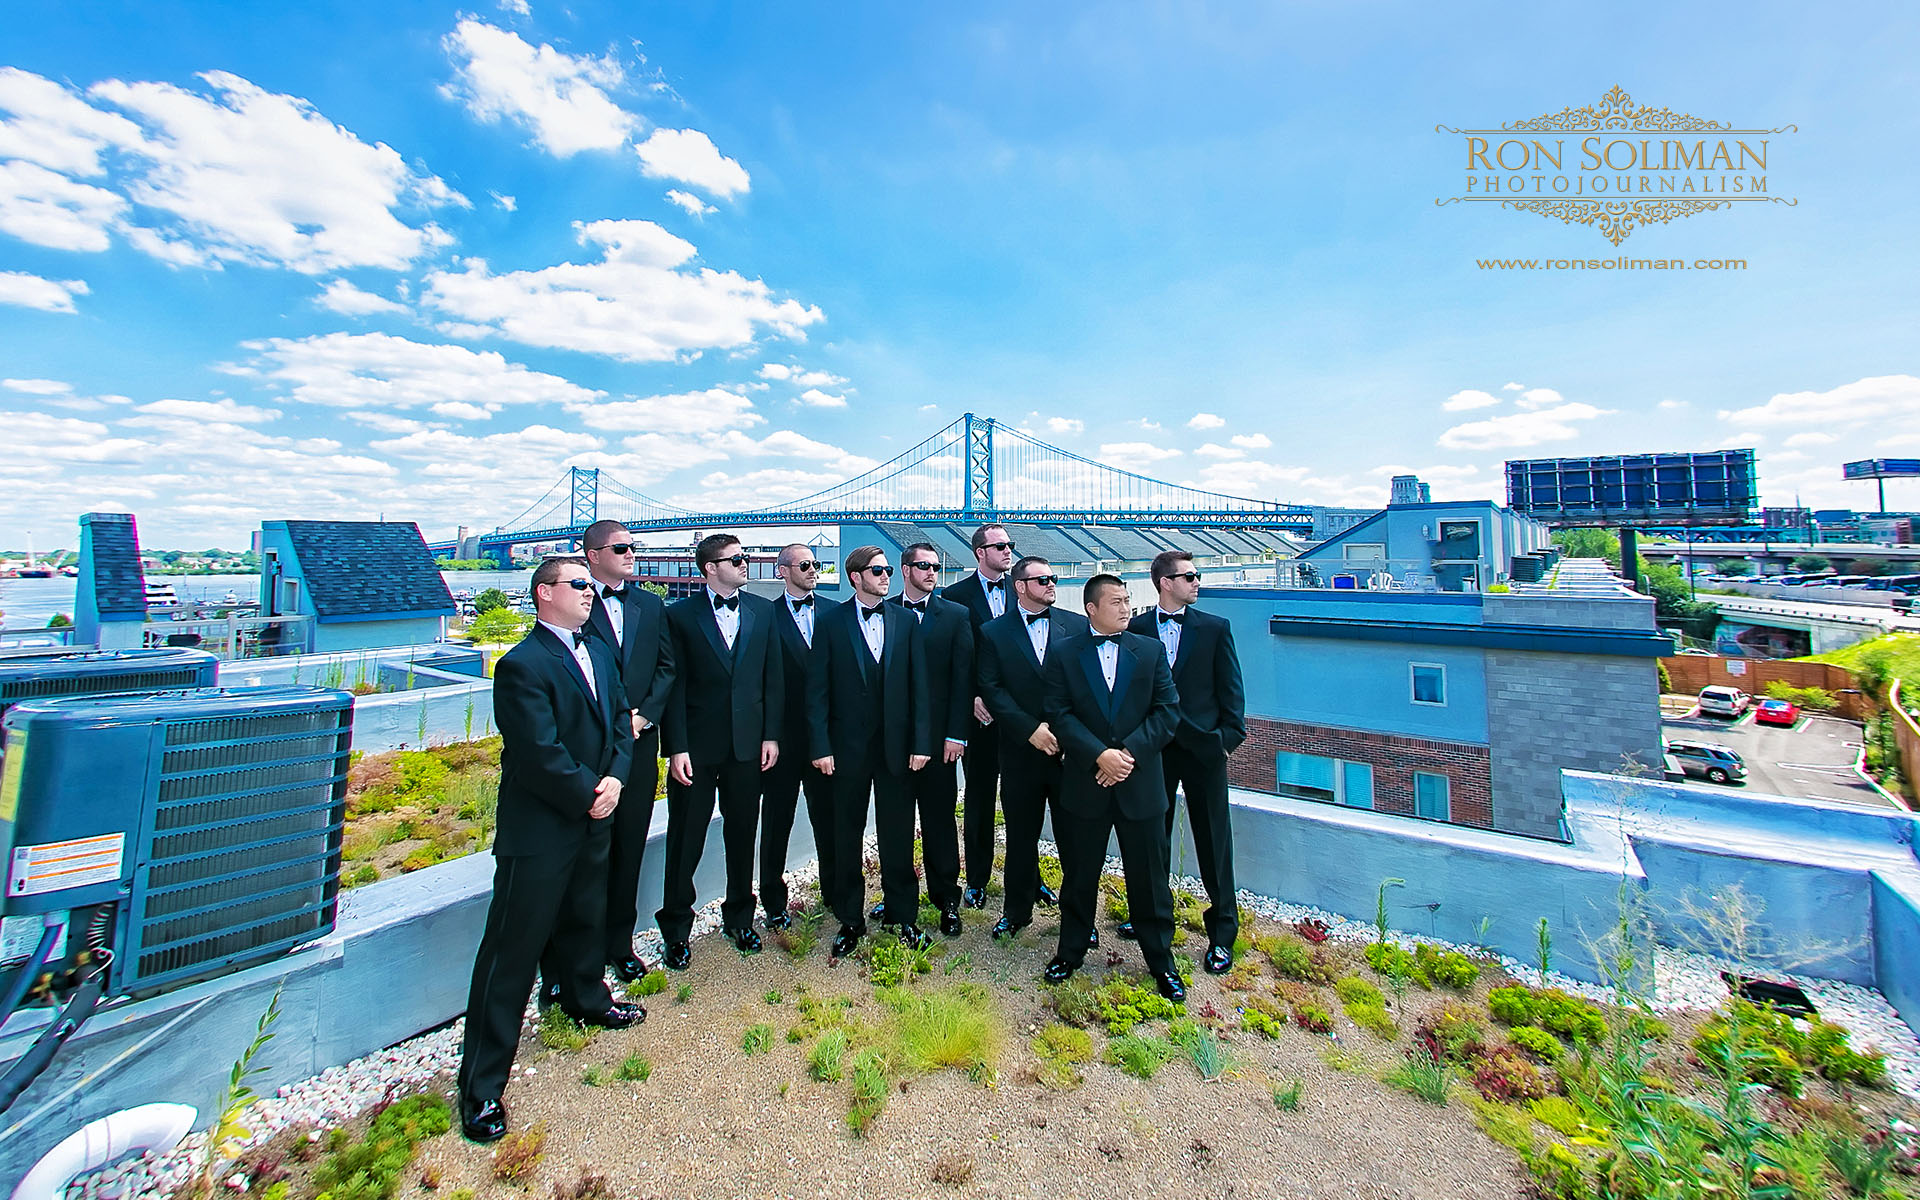 groomsmen photo at ben franklin bridge